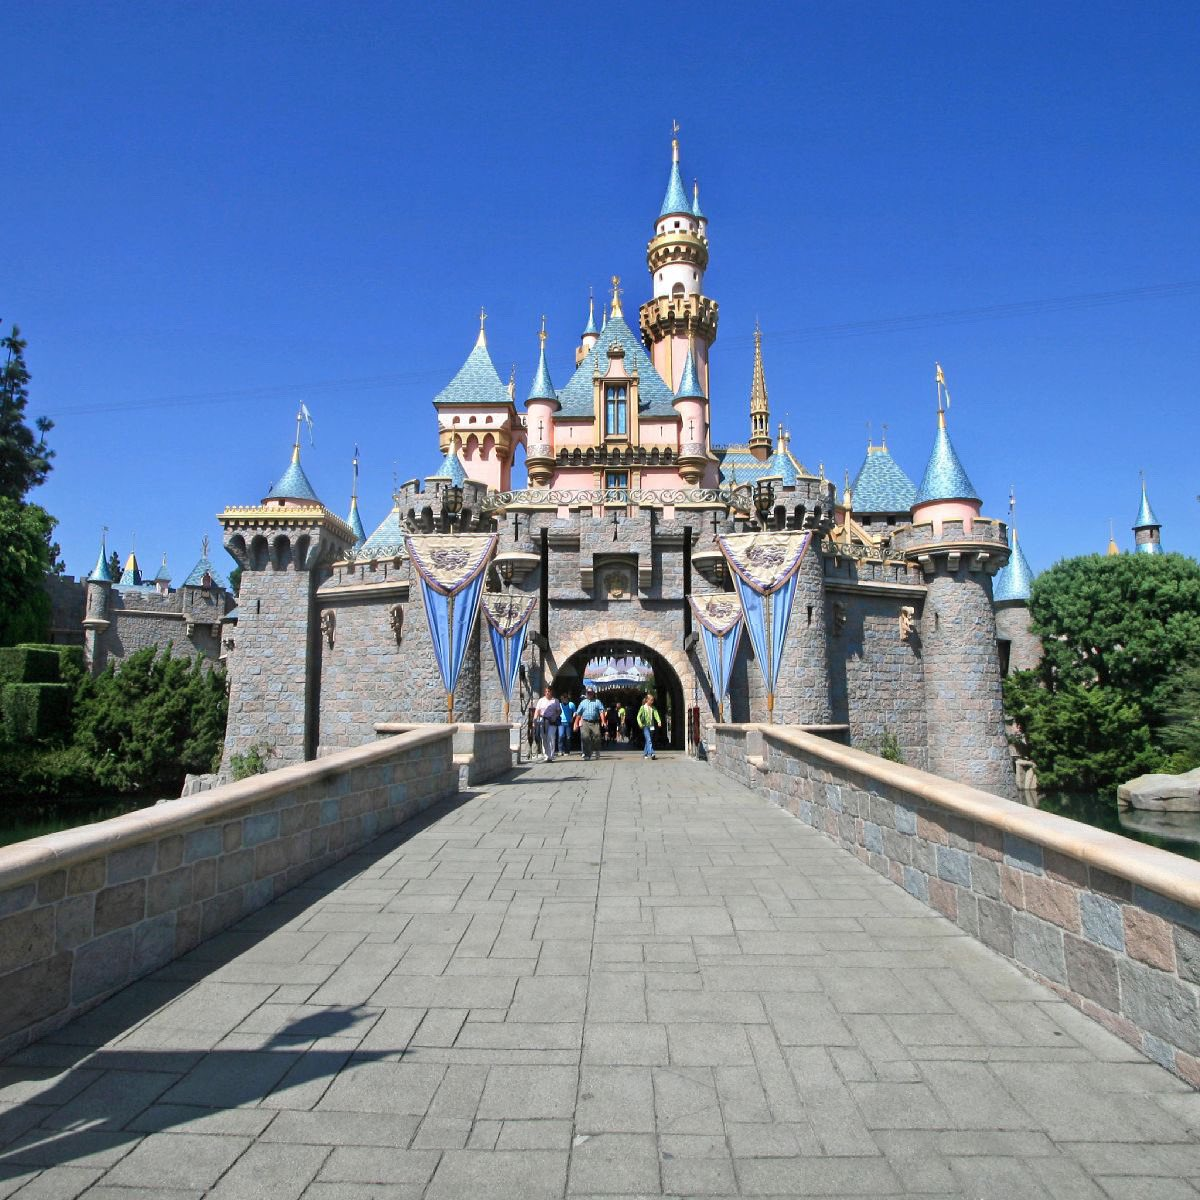 Disneyland, Universal and other California theme parks can reopen April 1 2021-click for more details ➡️  #disneyworld #waltdisney #disney #mickeymouse #wdw #magickingdom  #hollywoodstudios #Disneyfood #disneyland #Disneyland #disneycaliforniaadventure